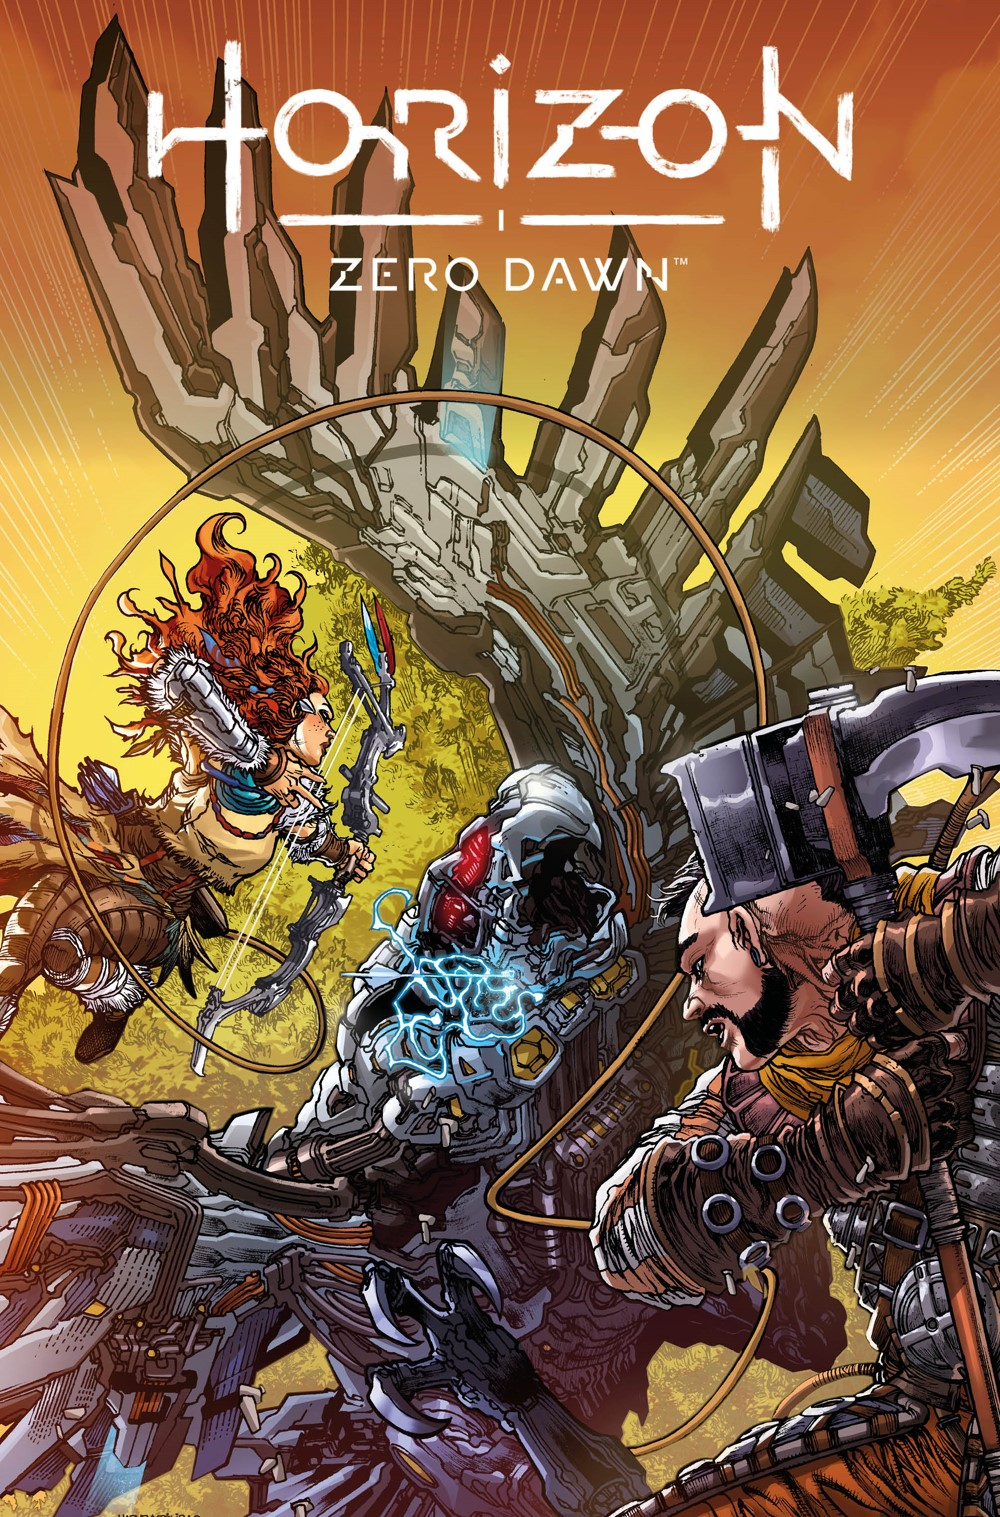 HorizonZeroDawn23_00_Cover_C-1 Titan Comics September 2021 Solicitations